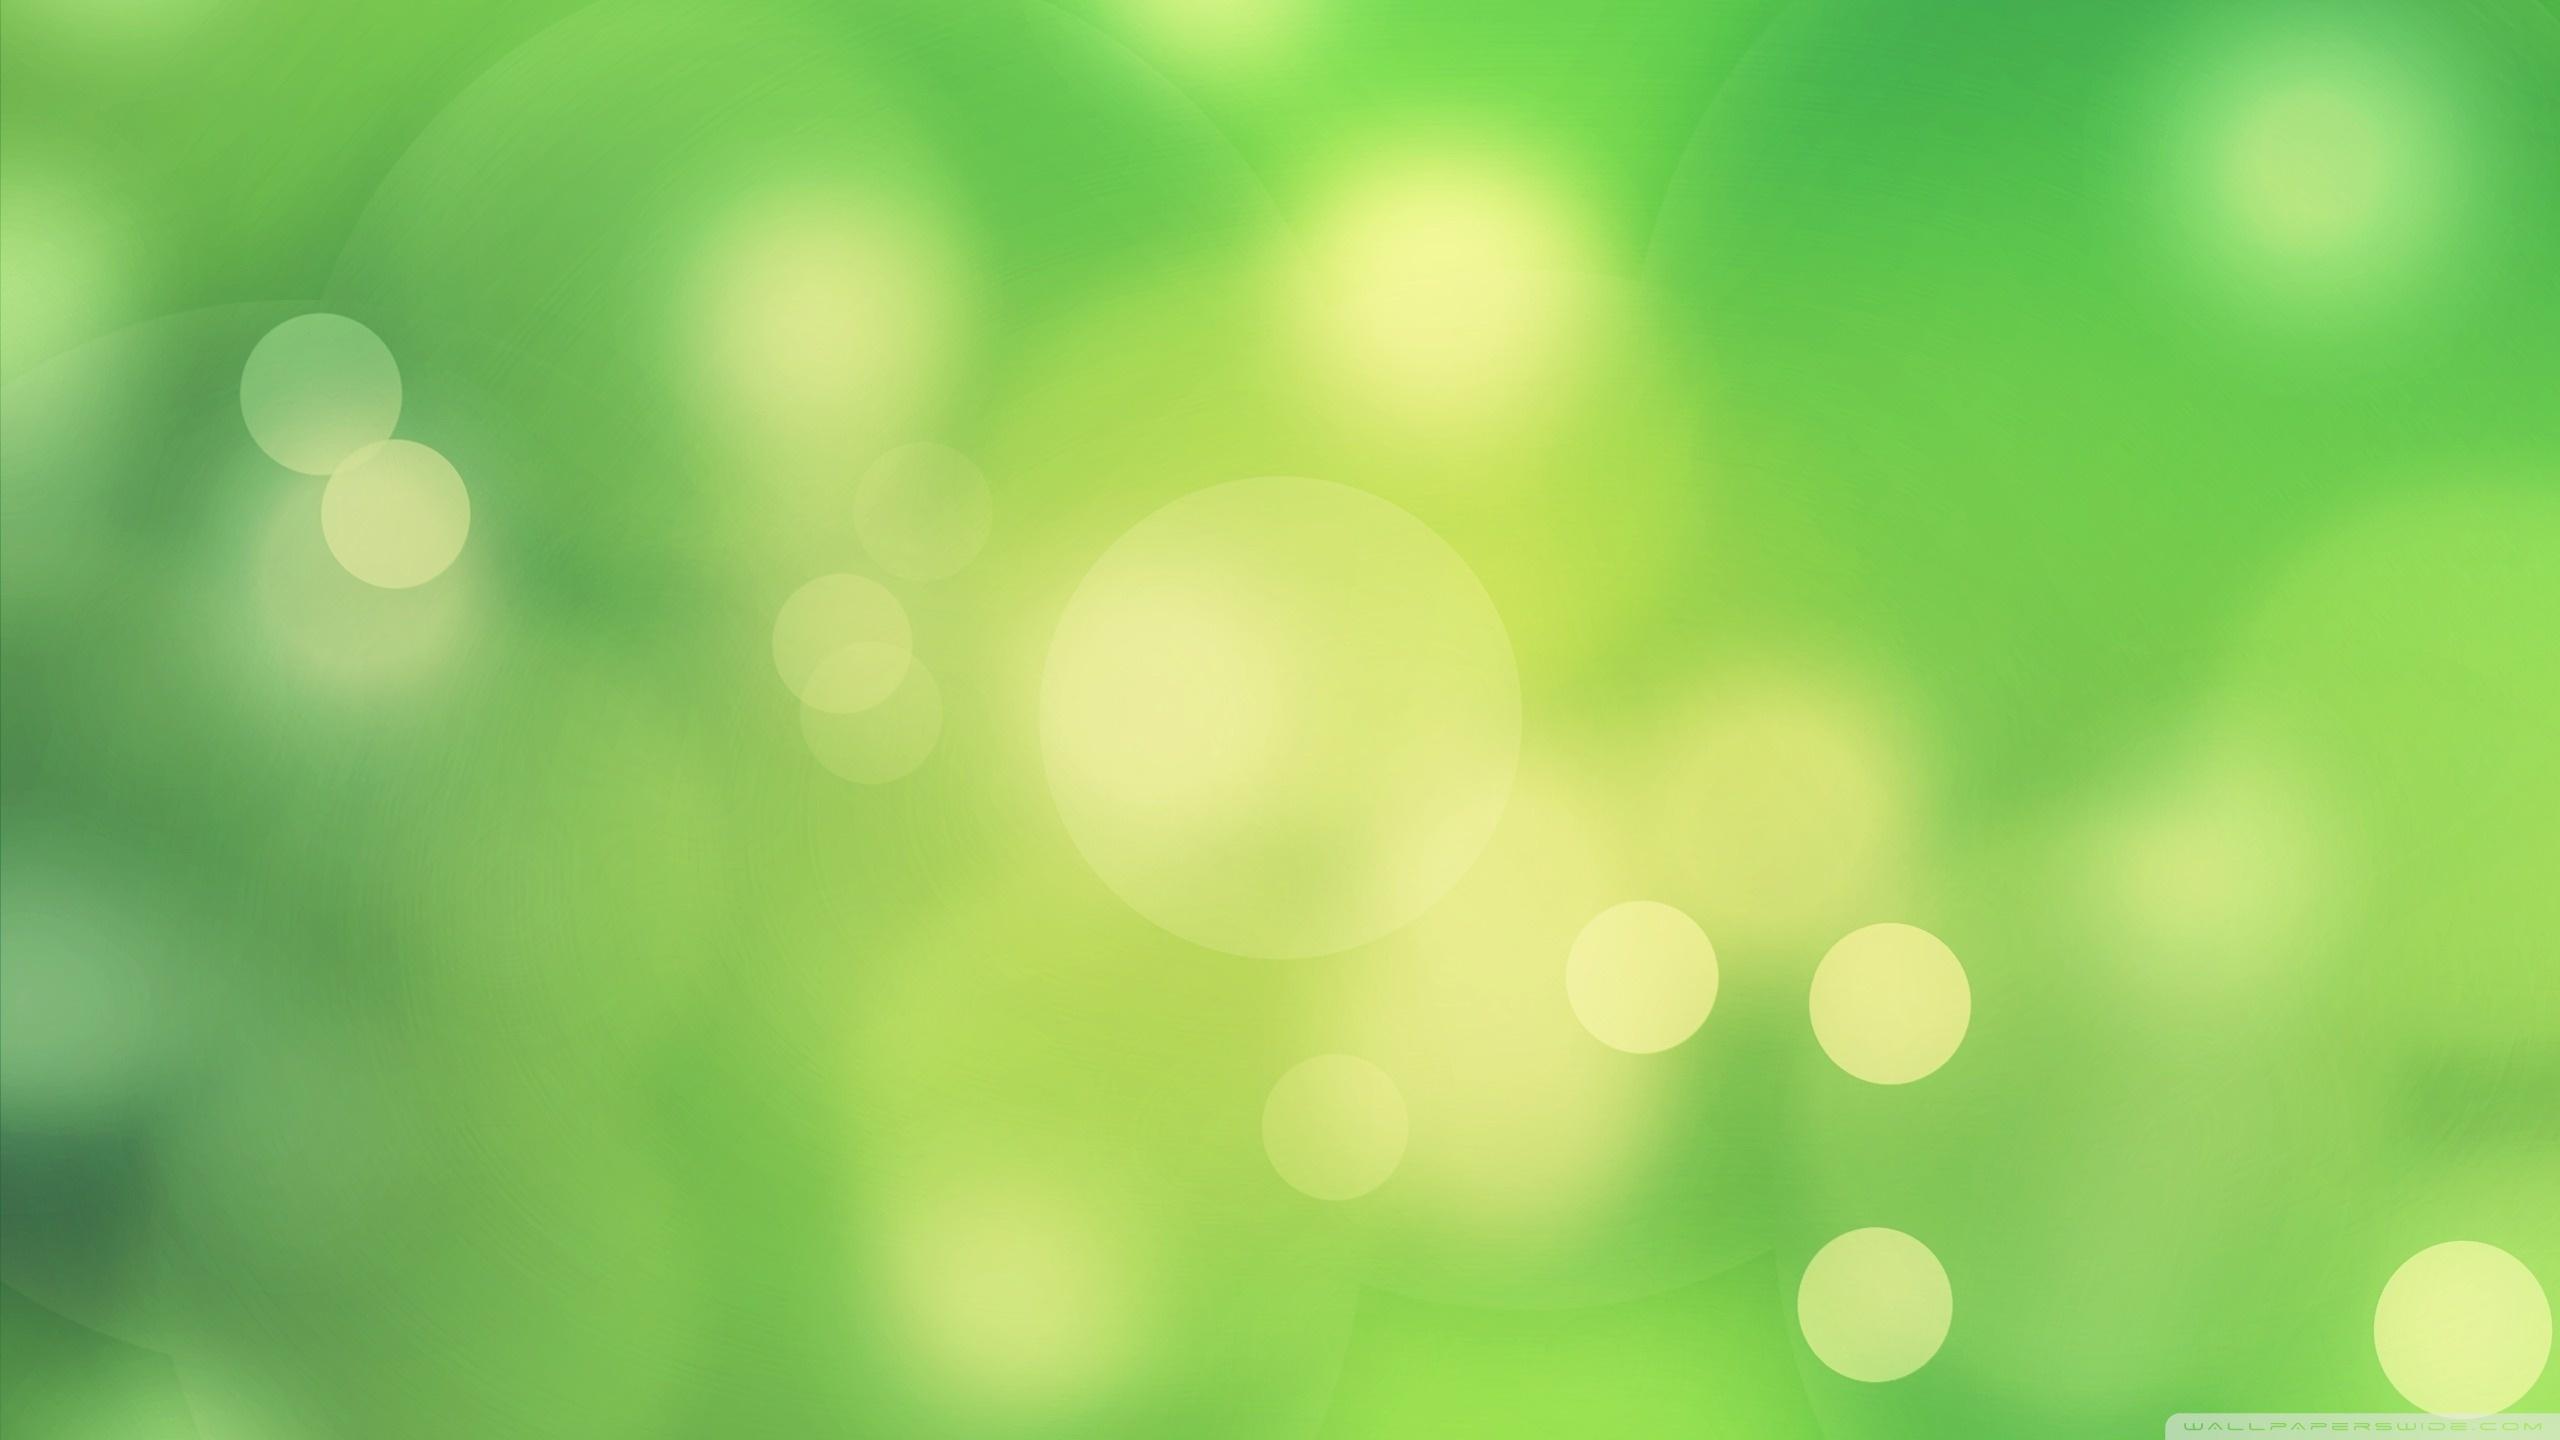 Green And Black Iphone Wallpaper  31 Free Hd Wallpaper